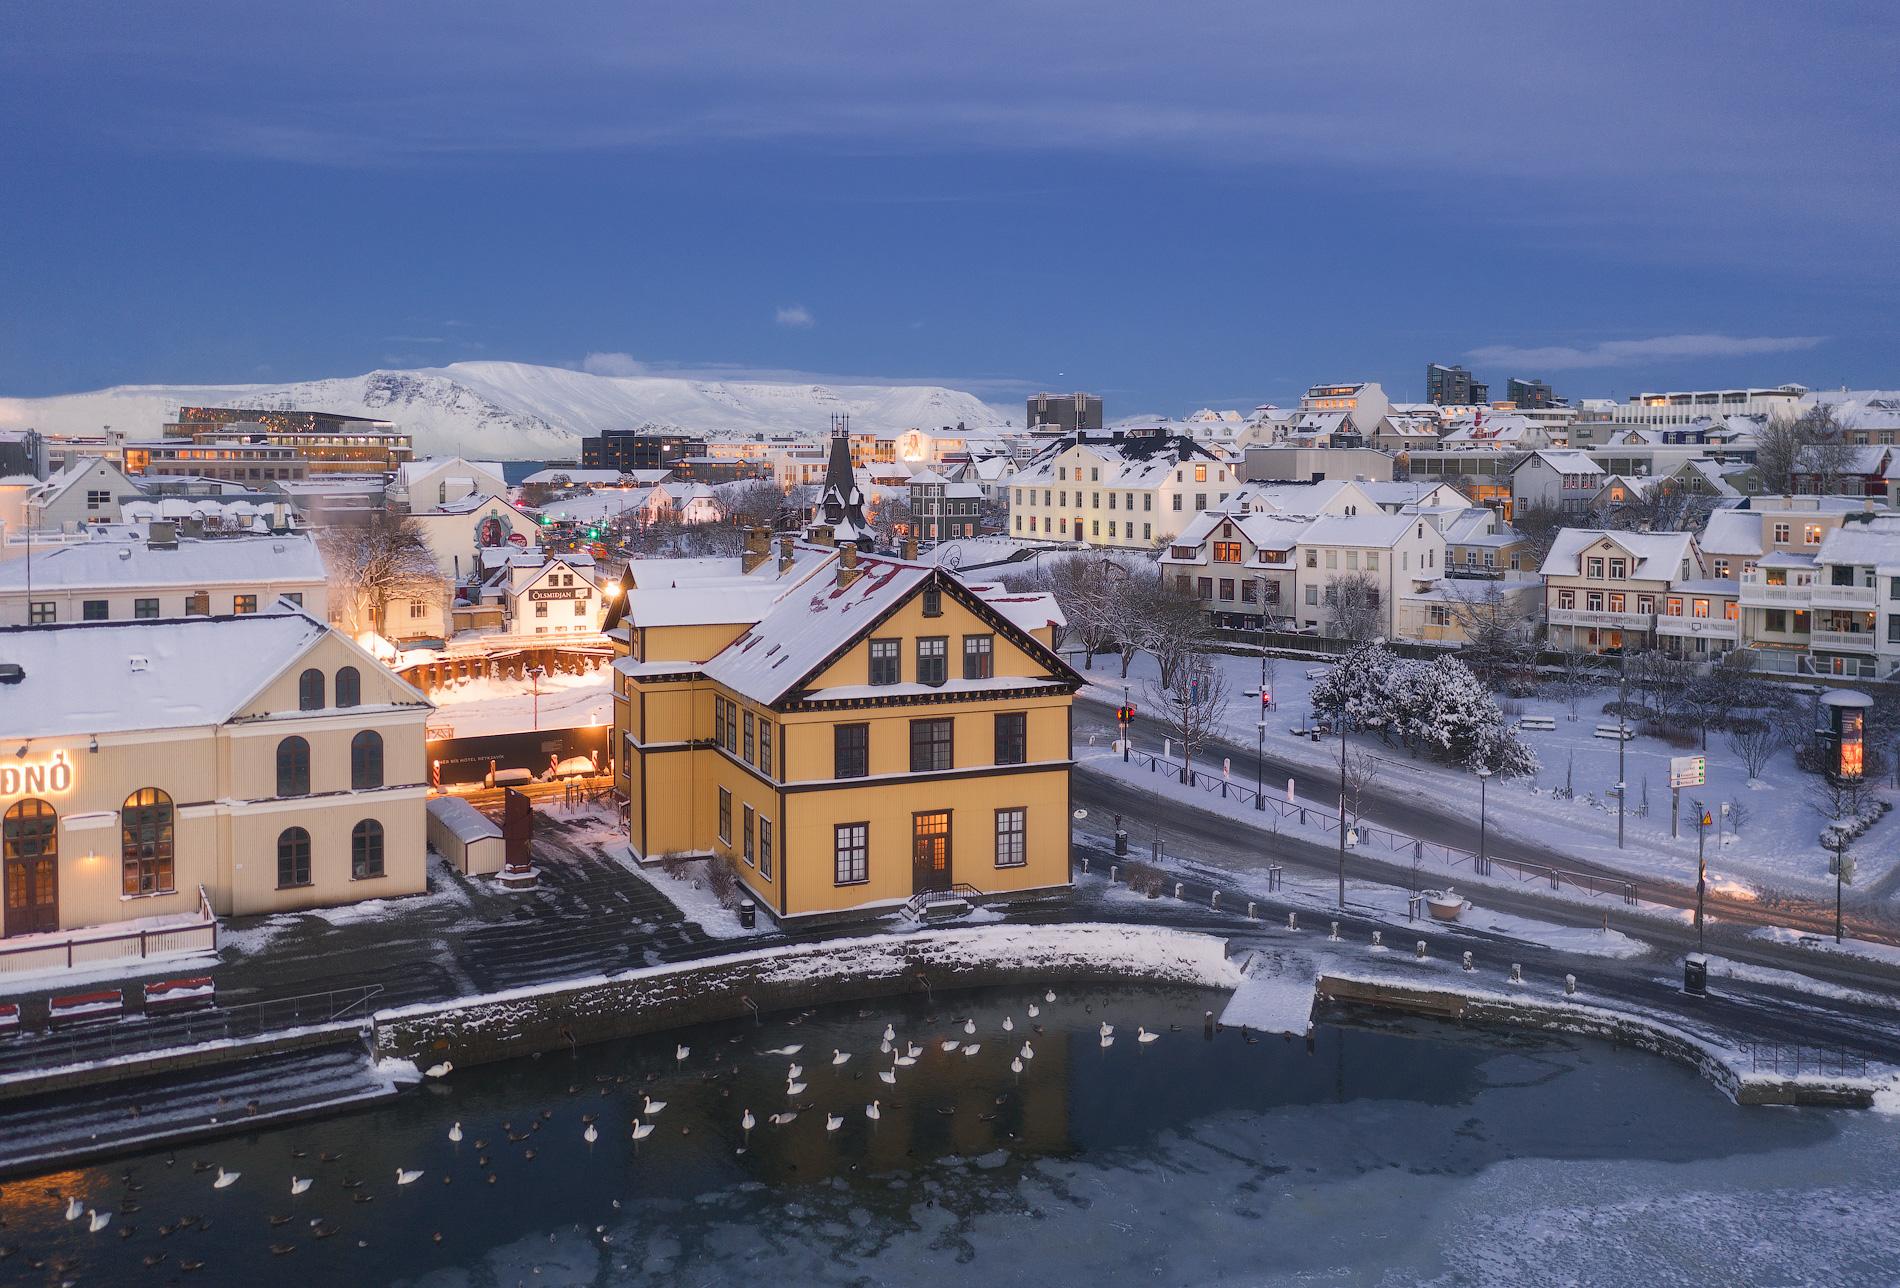 Downtown Reykjavík with a fine dusting of snow.